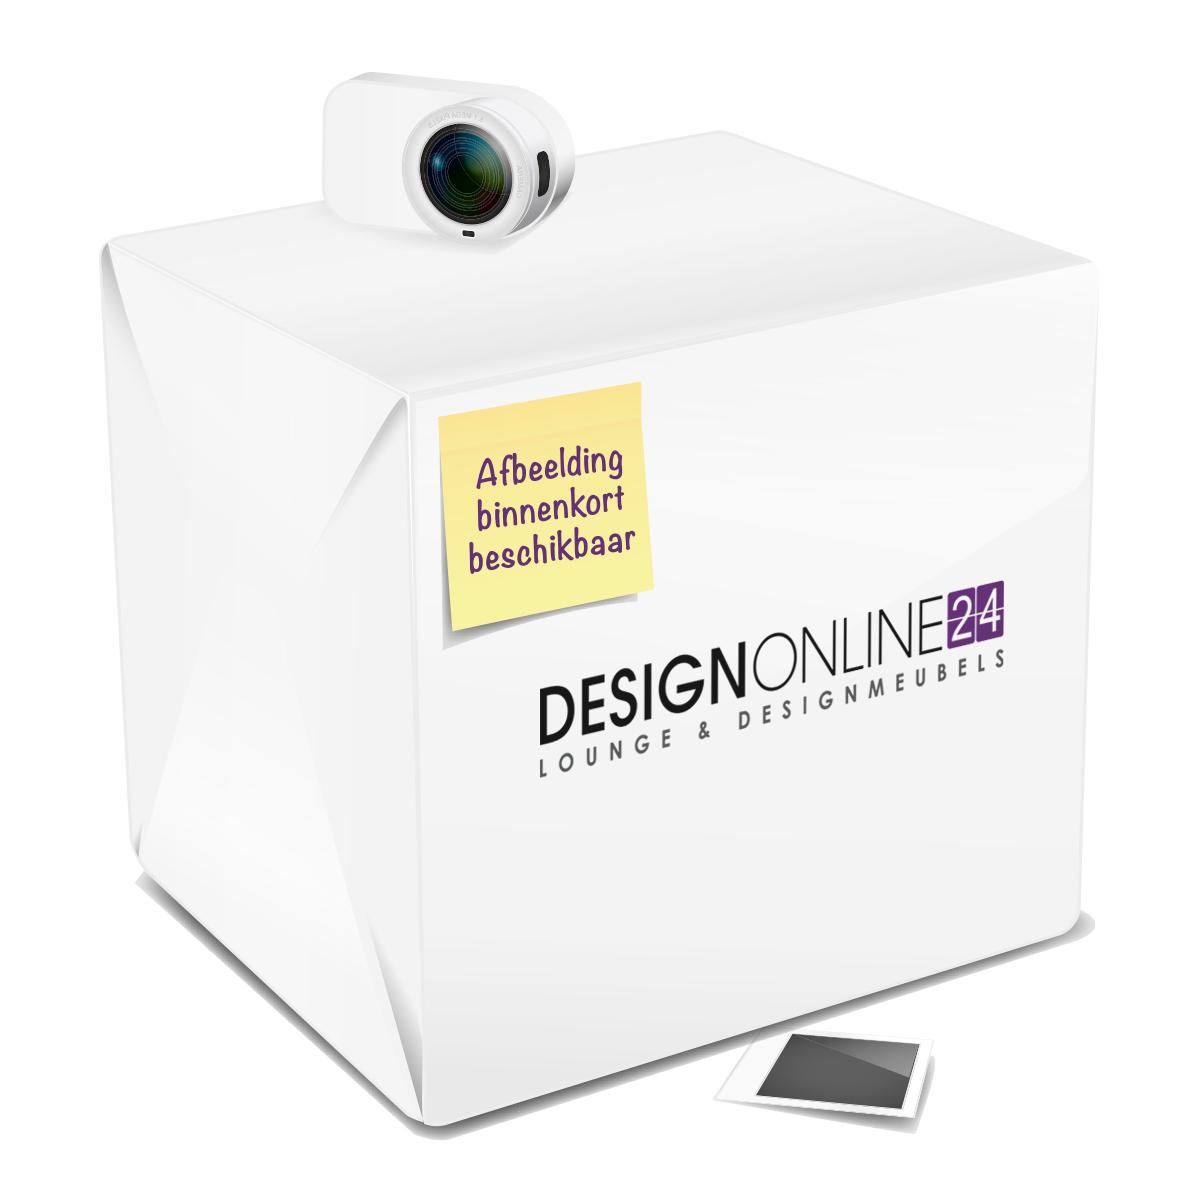 Innovation Innovation Slaapbank Dublexo Armleuningen - Styletto Poten Donker - Twist Charcoal 563 - Grijs